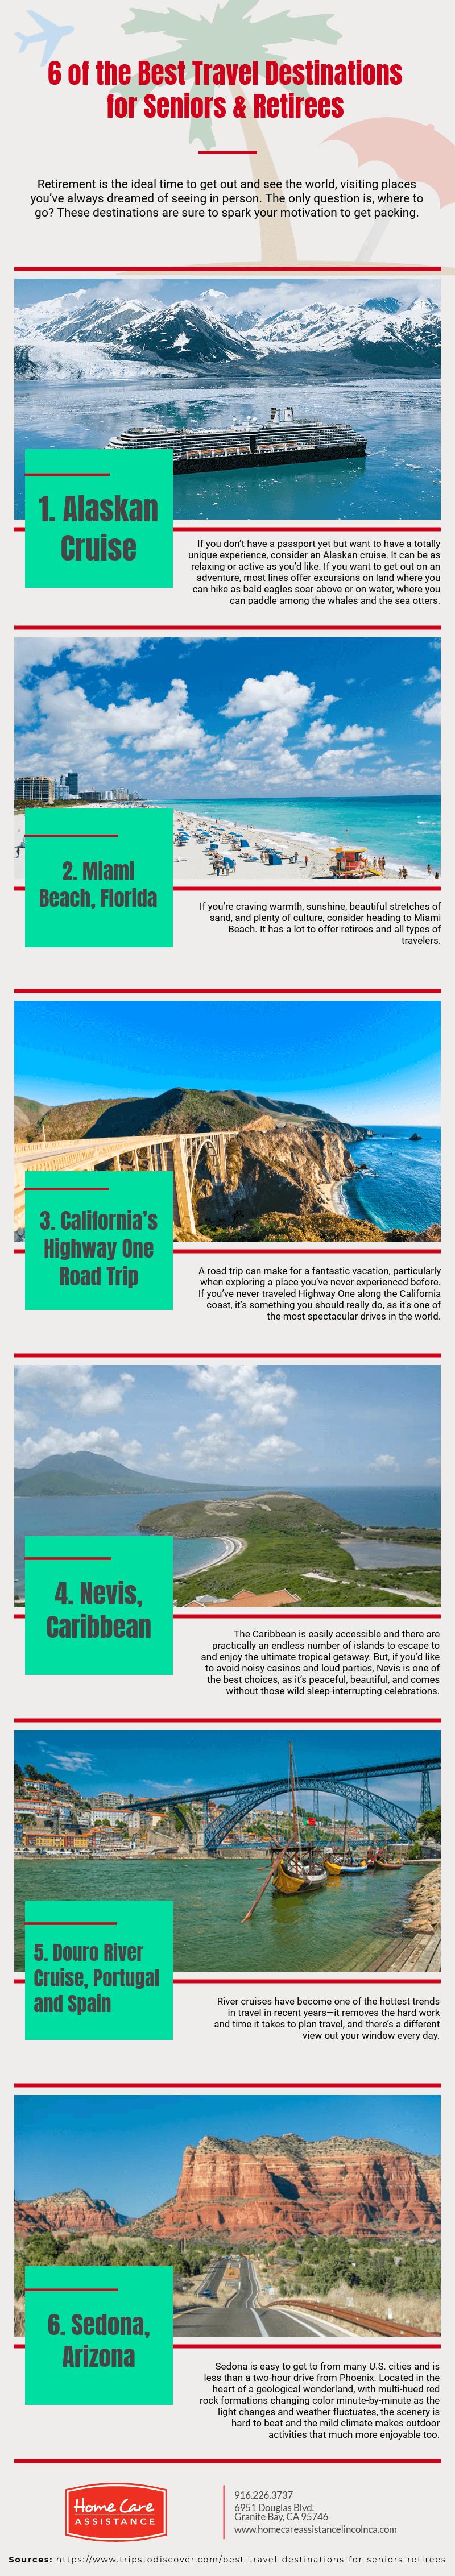 Best Travel Destinations for Seniors & Retirees